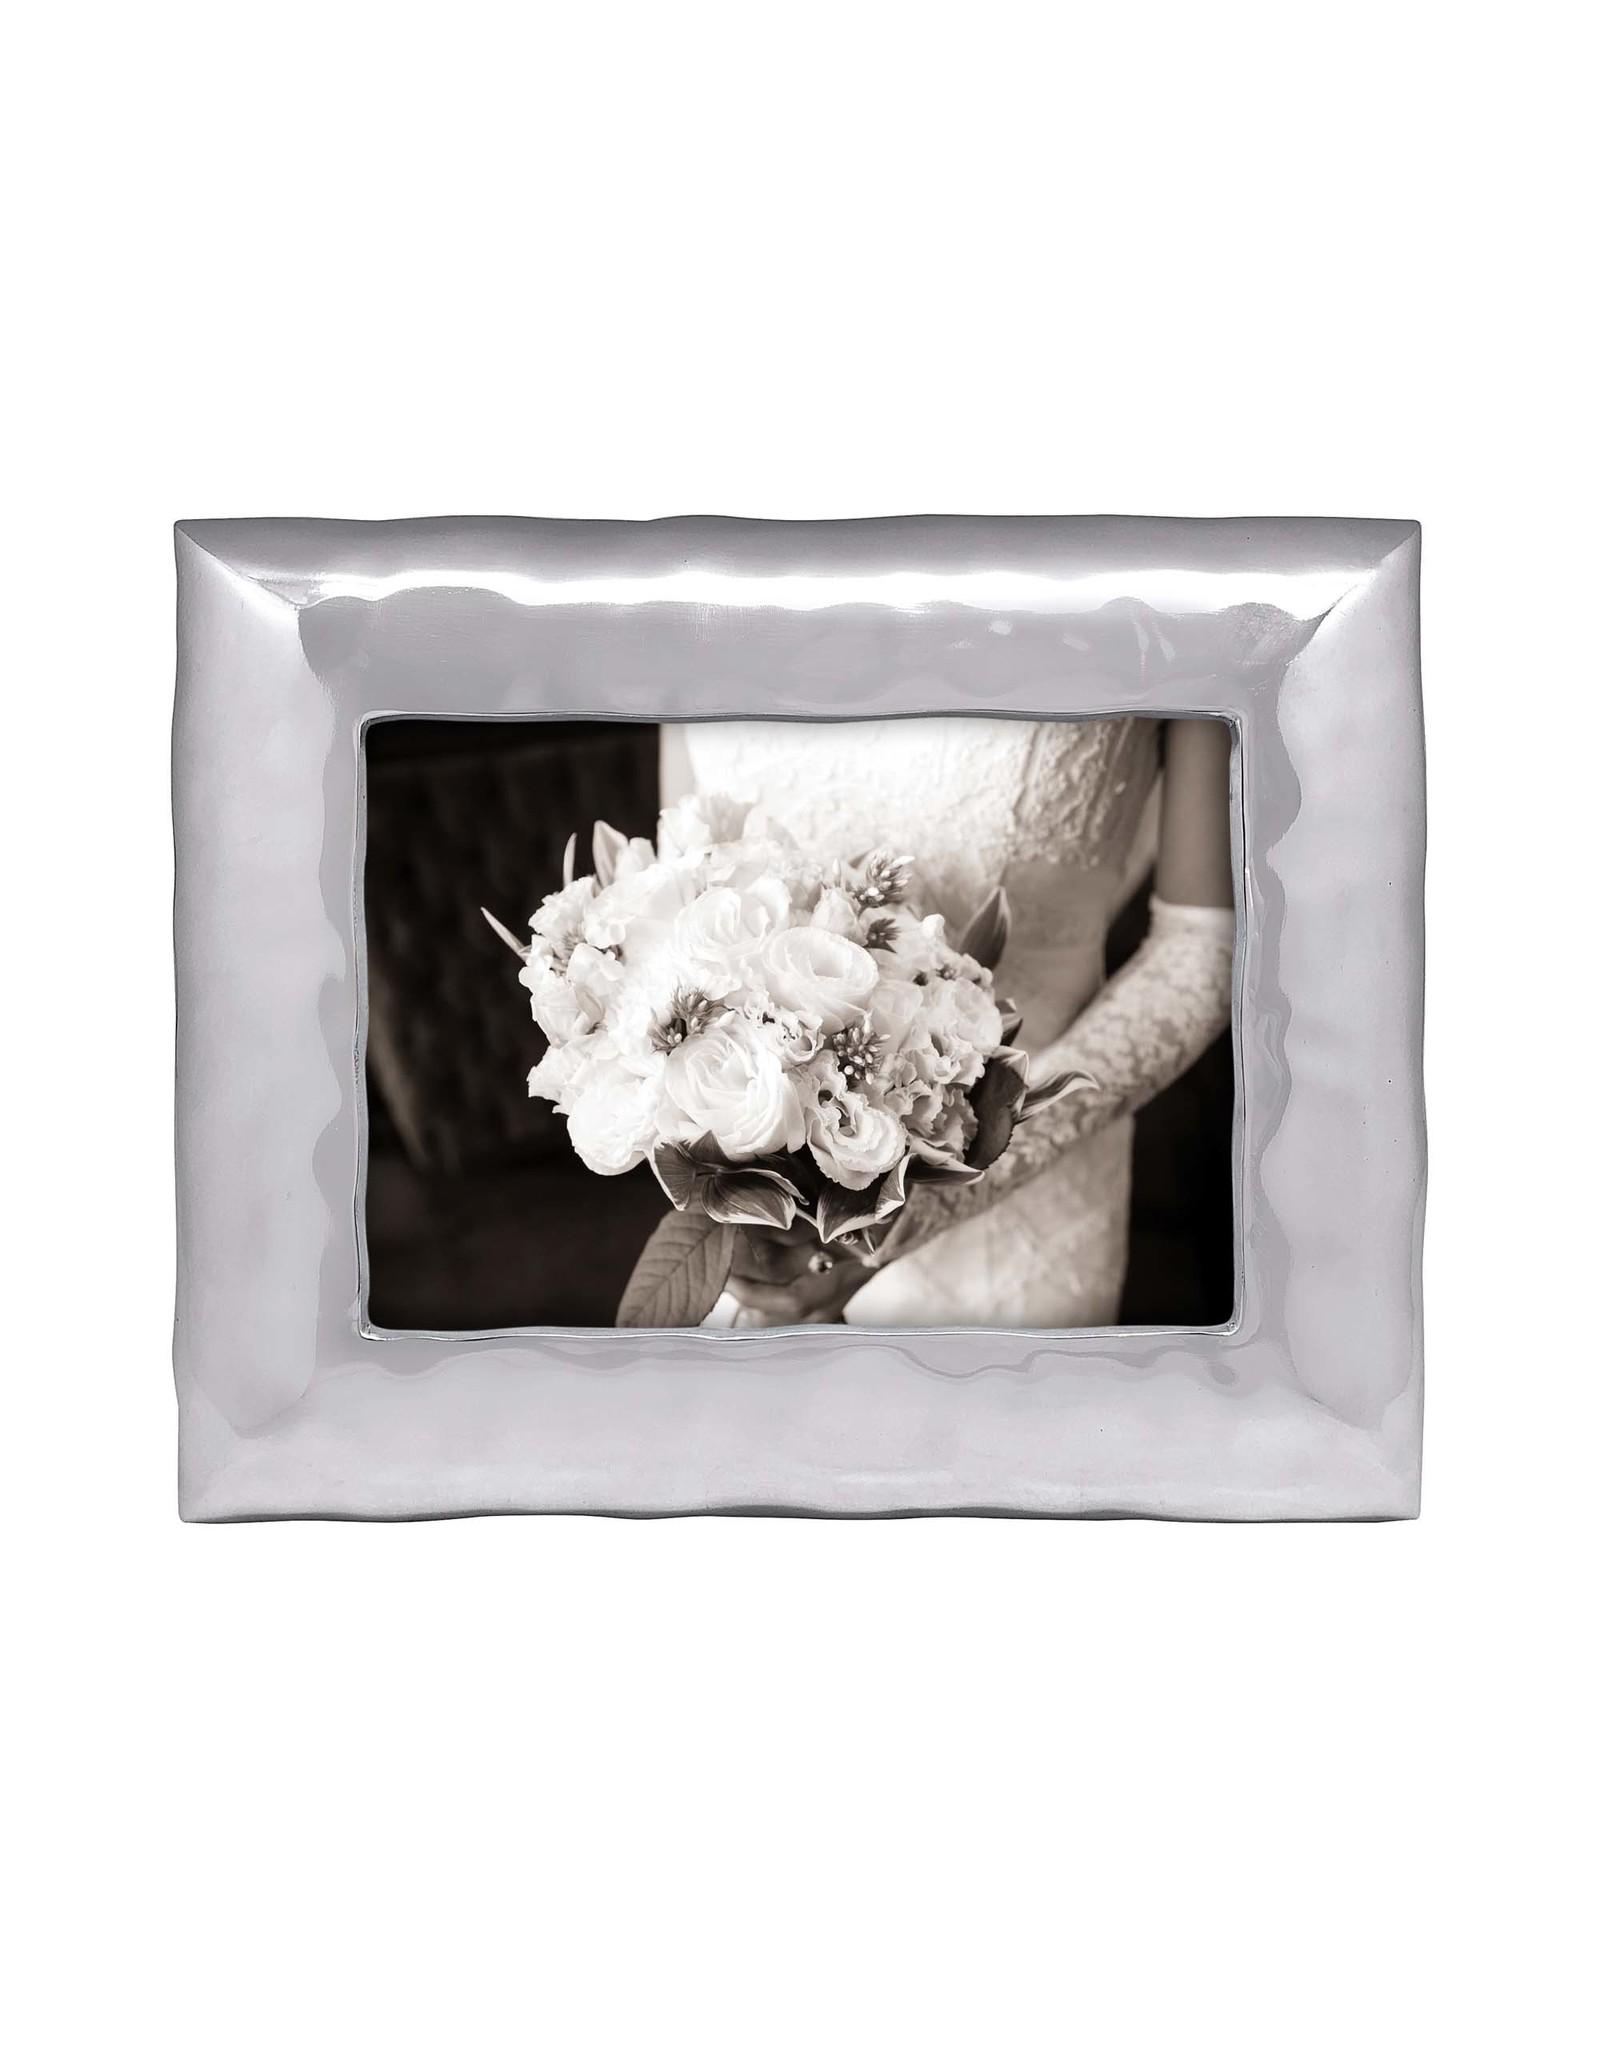 Mariposa Frame Shimmer 5x7